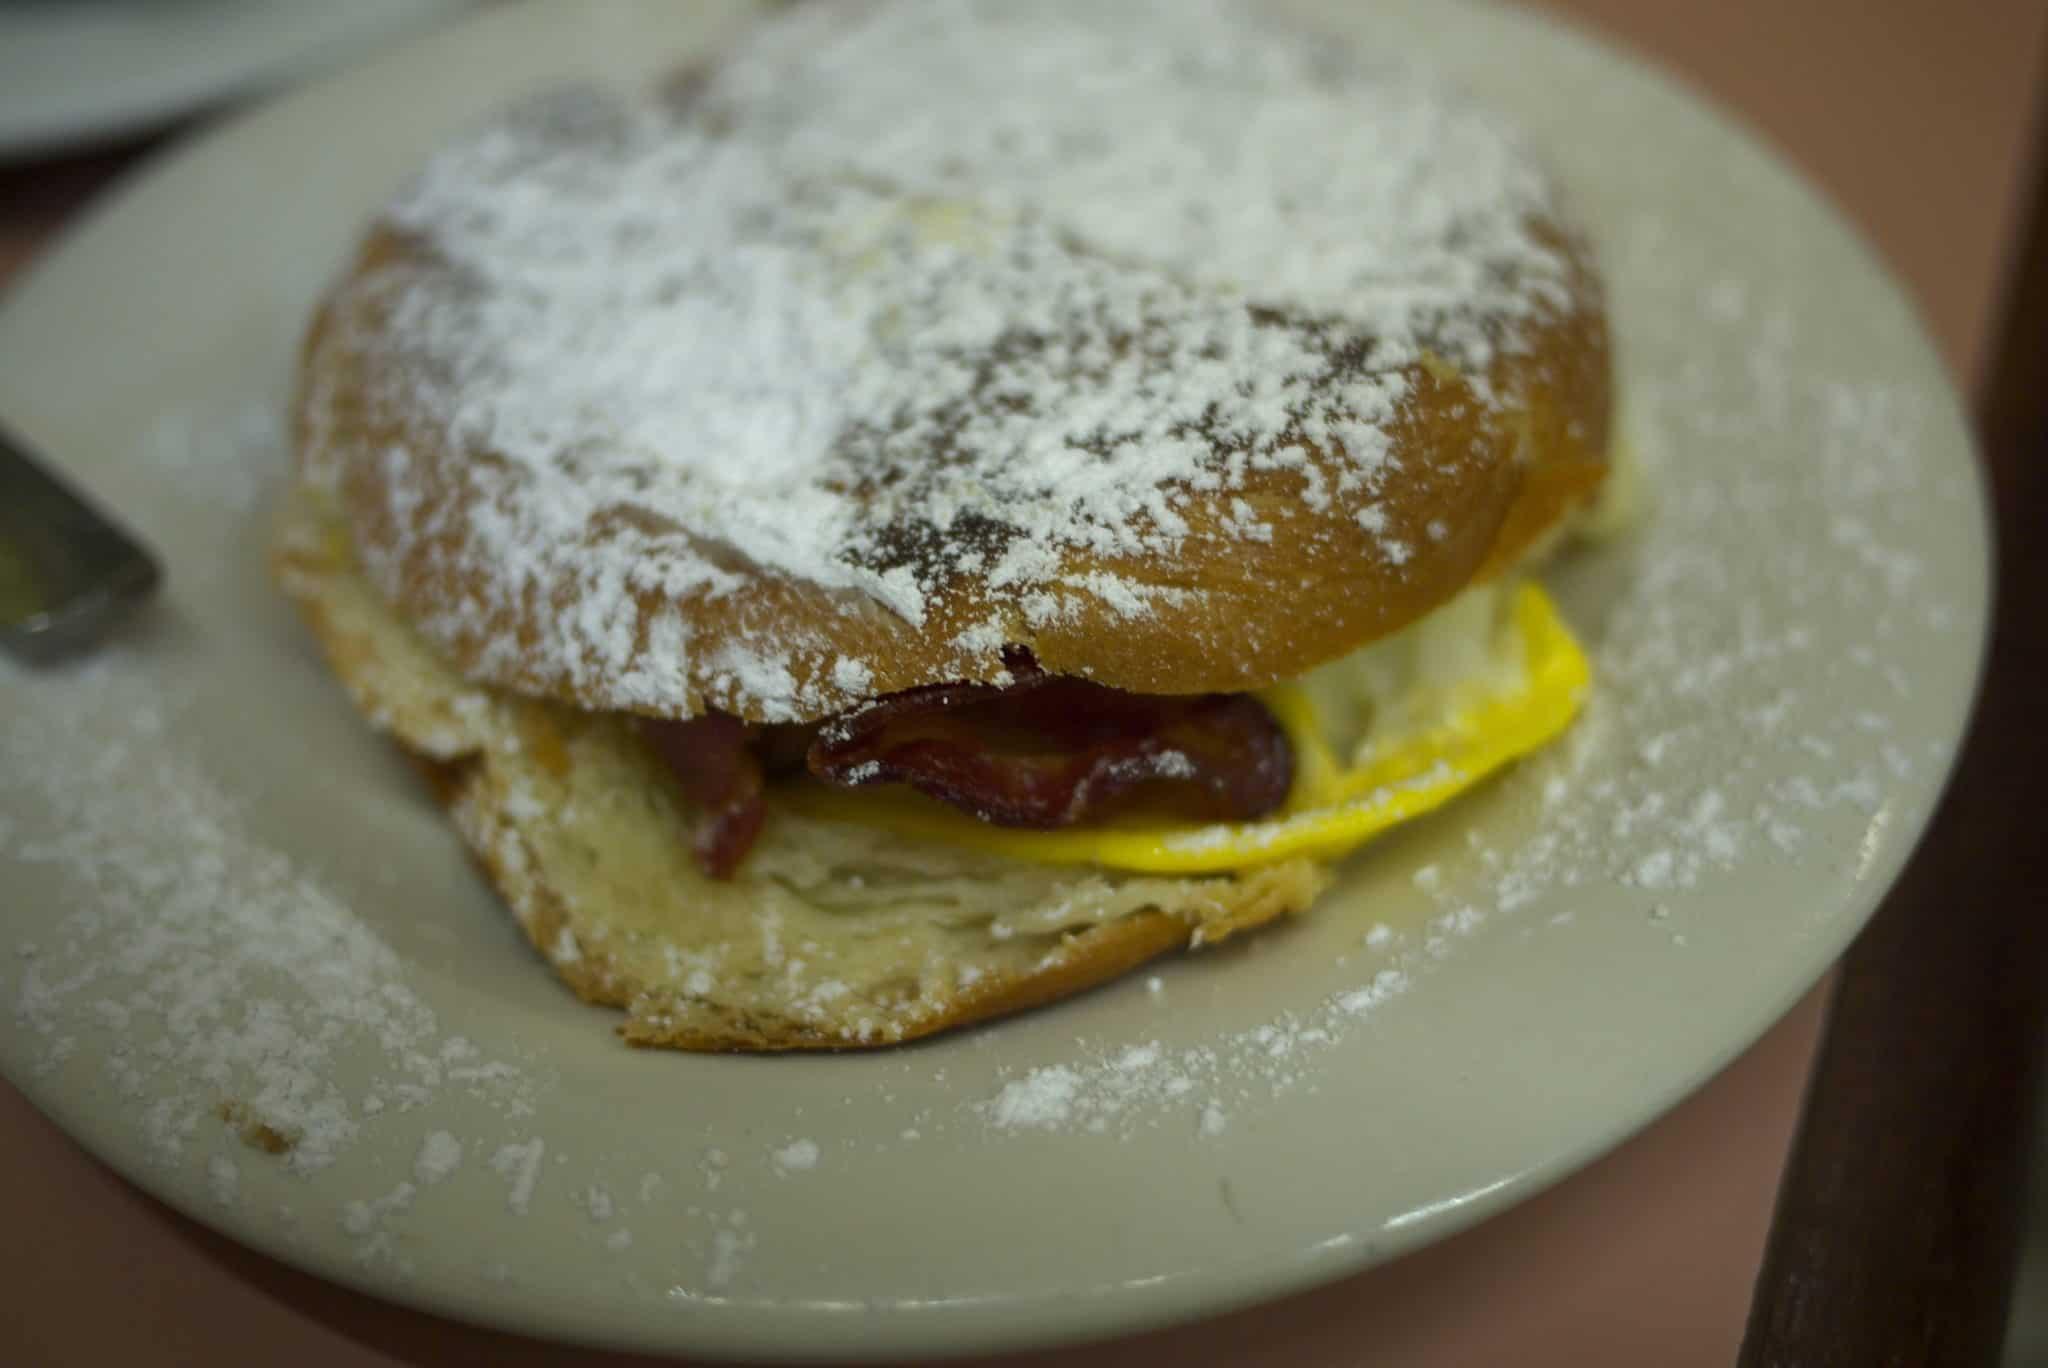 mallorca pastry